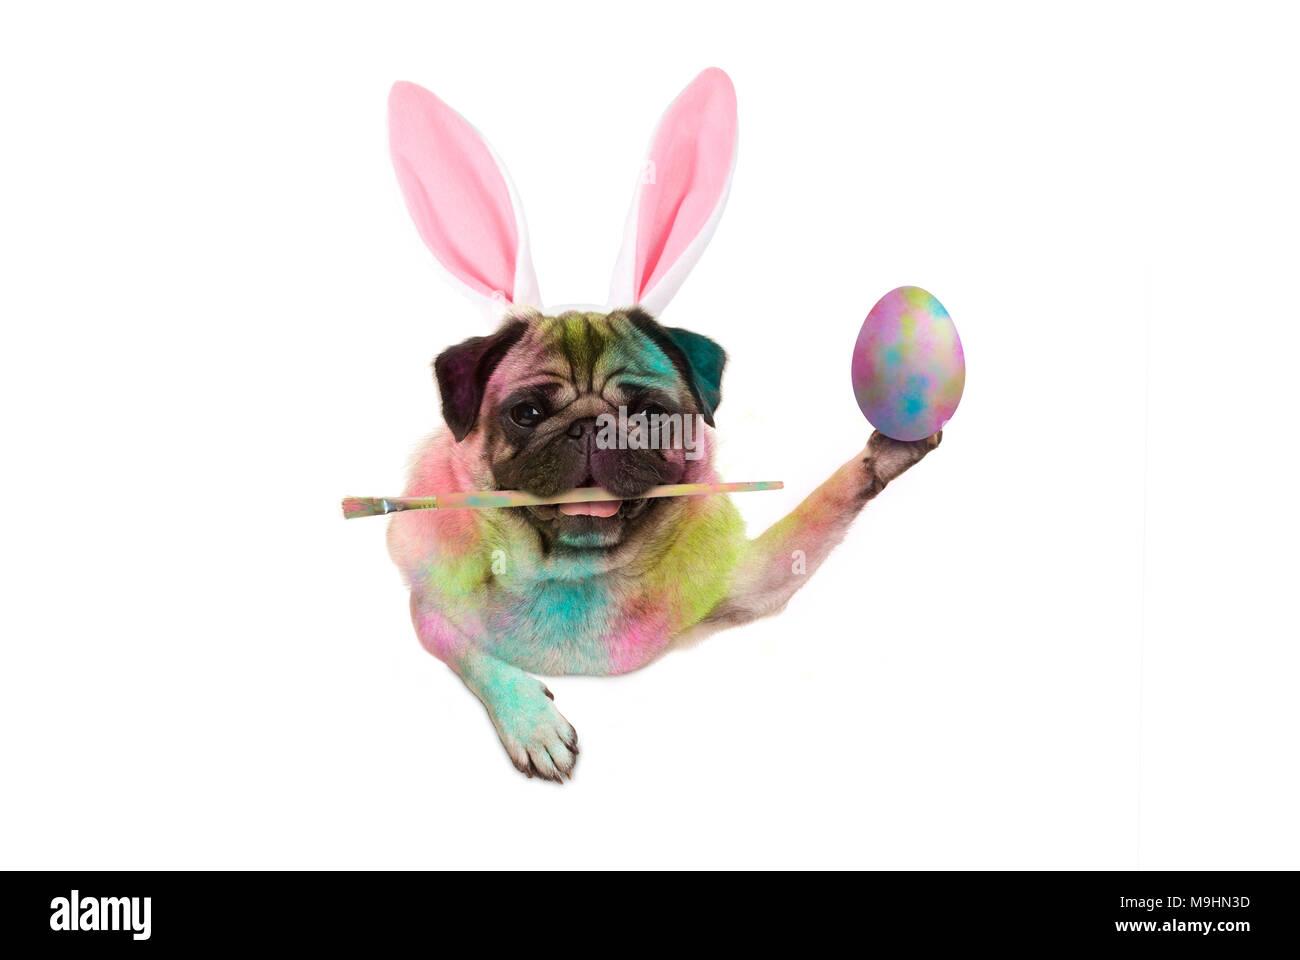 colorful easter pug dog bunny painting easter eggs, holding paintbrush, isolated on white background - Stock Image